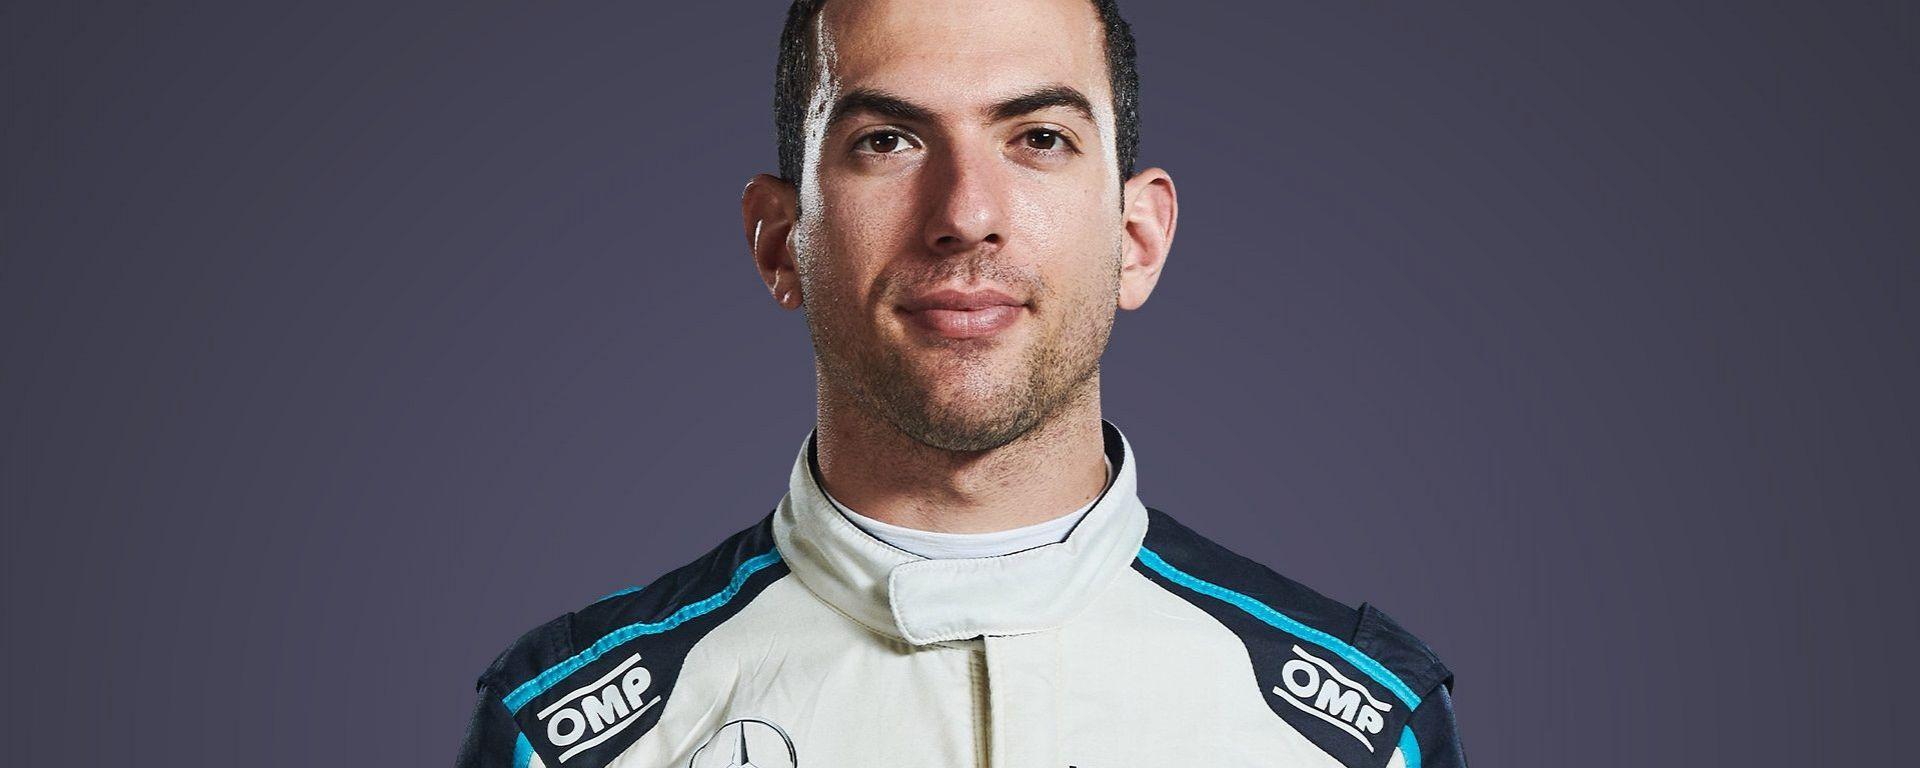 F1 2021, Nicholas Latifi (Williams Racing)